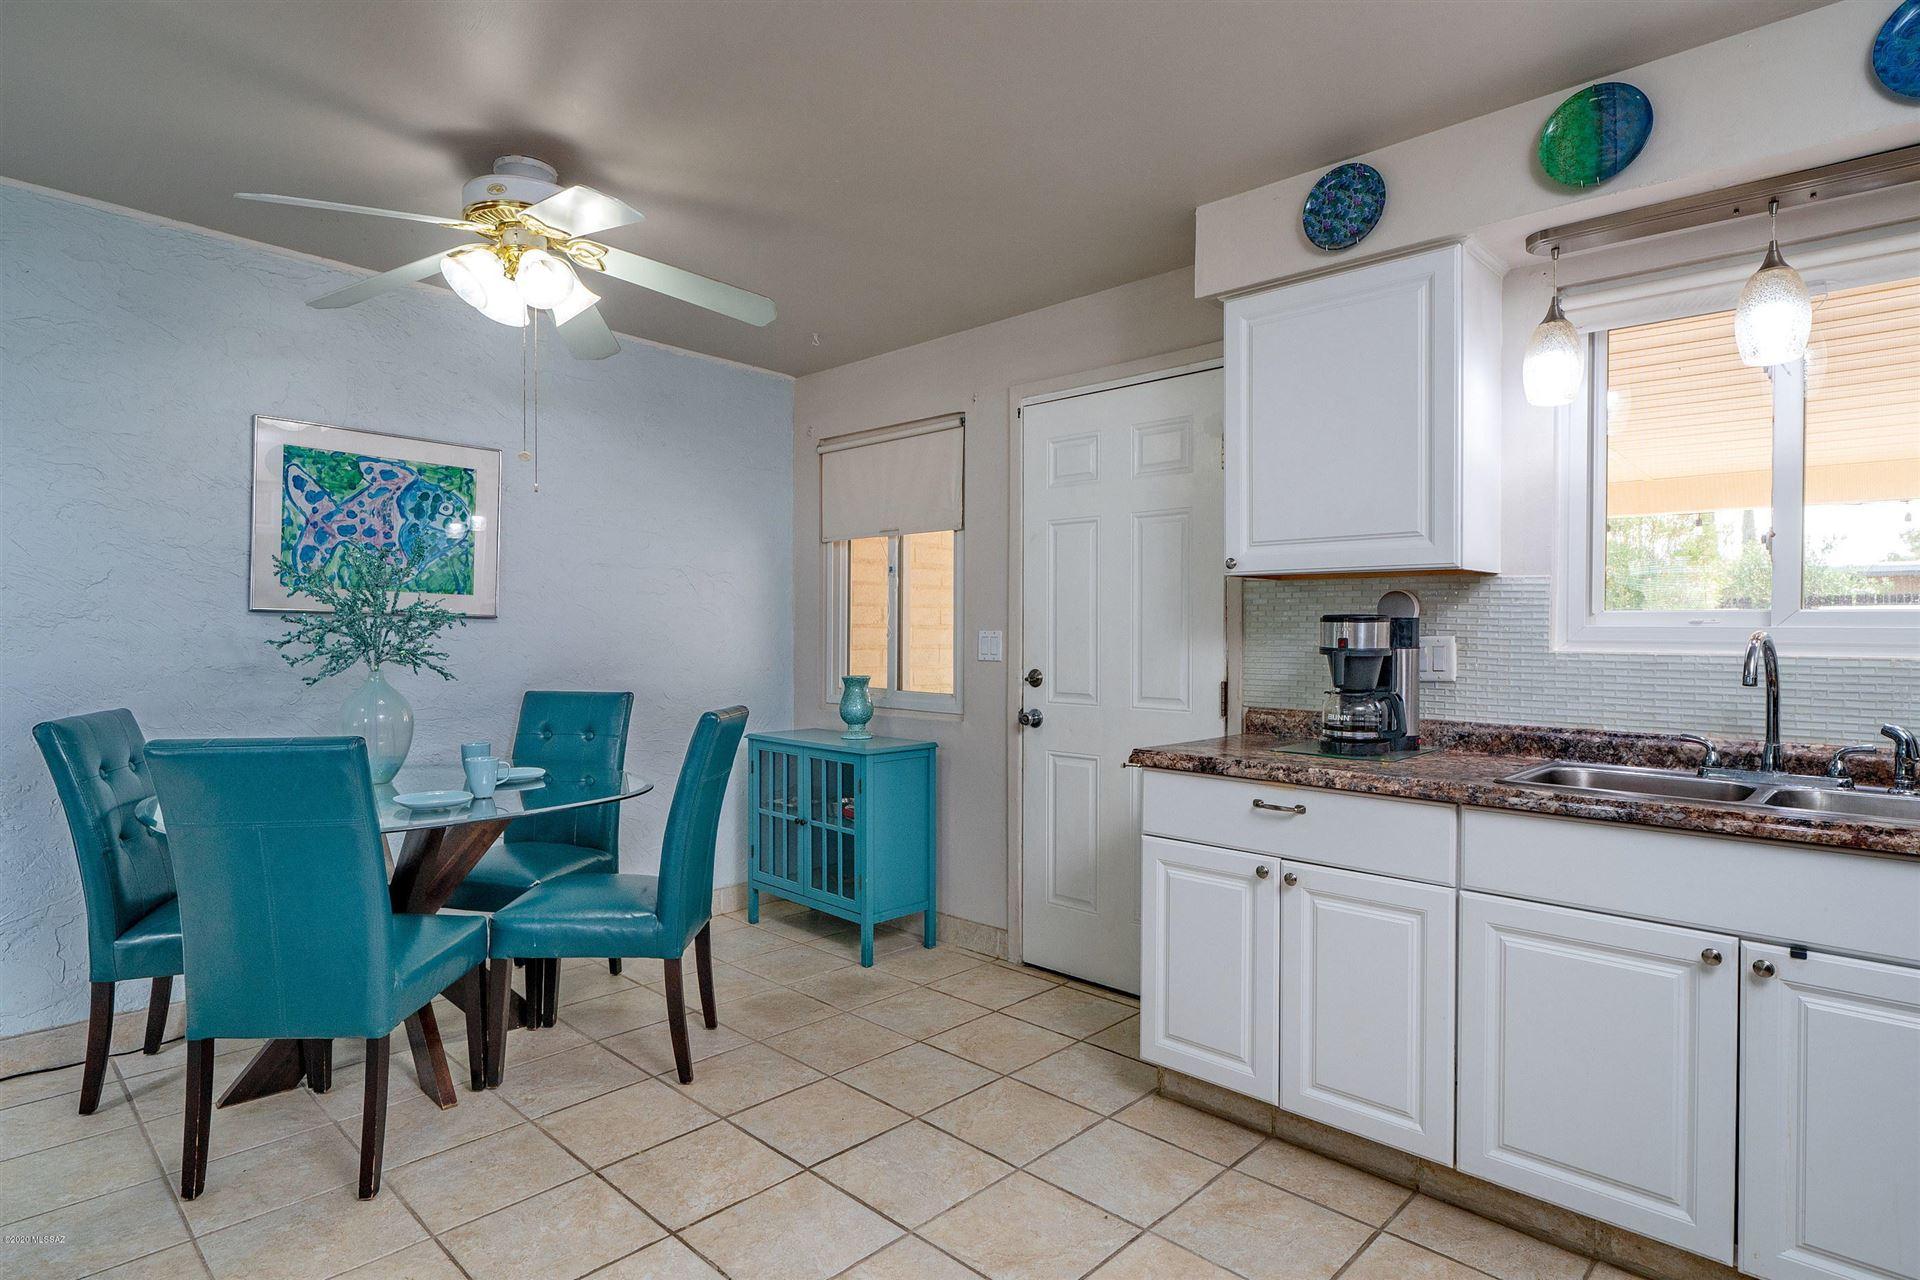 3511 S Fairbanks Avenue, Tucson, AZ 85730 - MLS#: 22022438